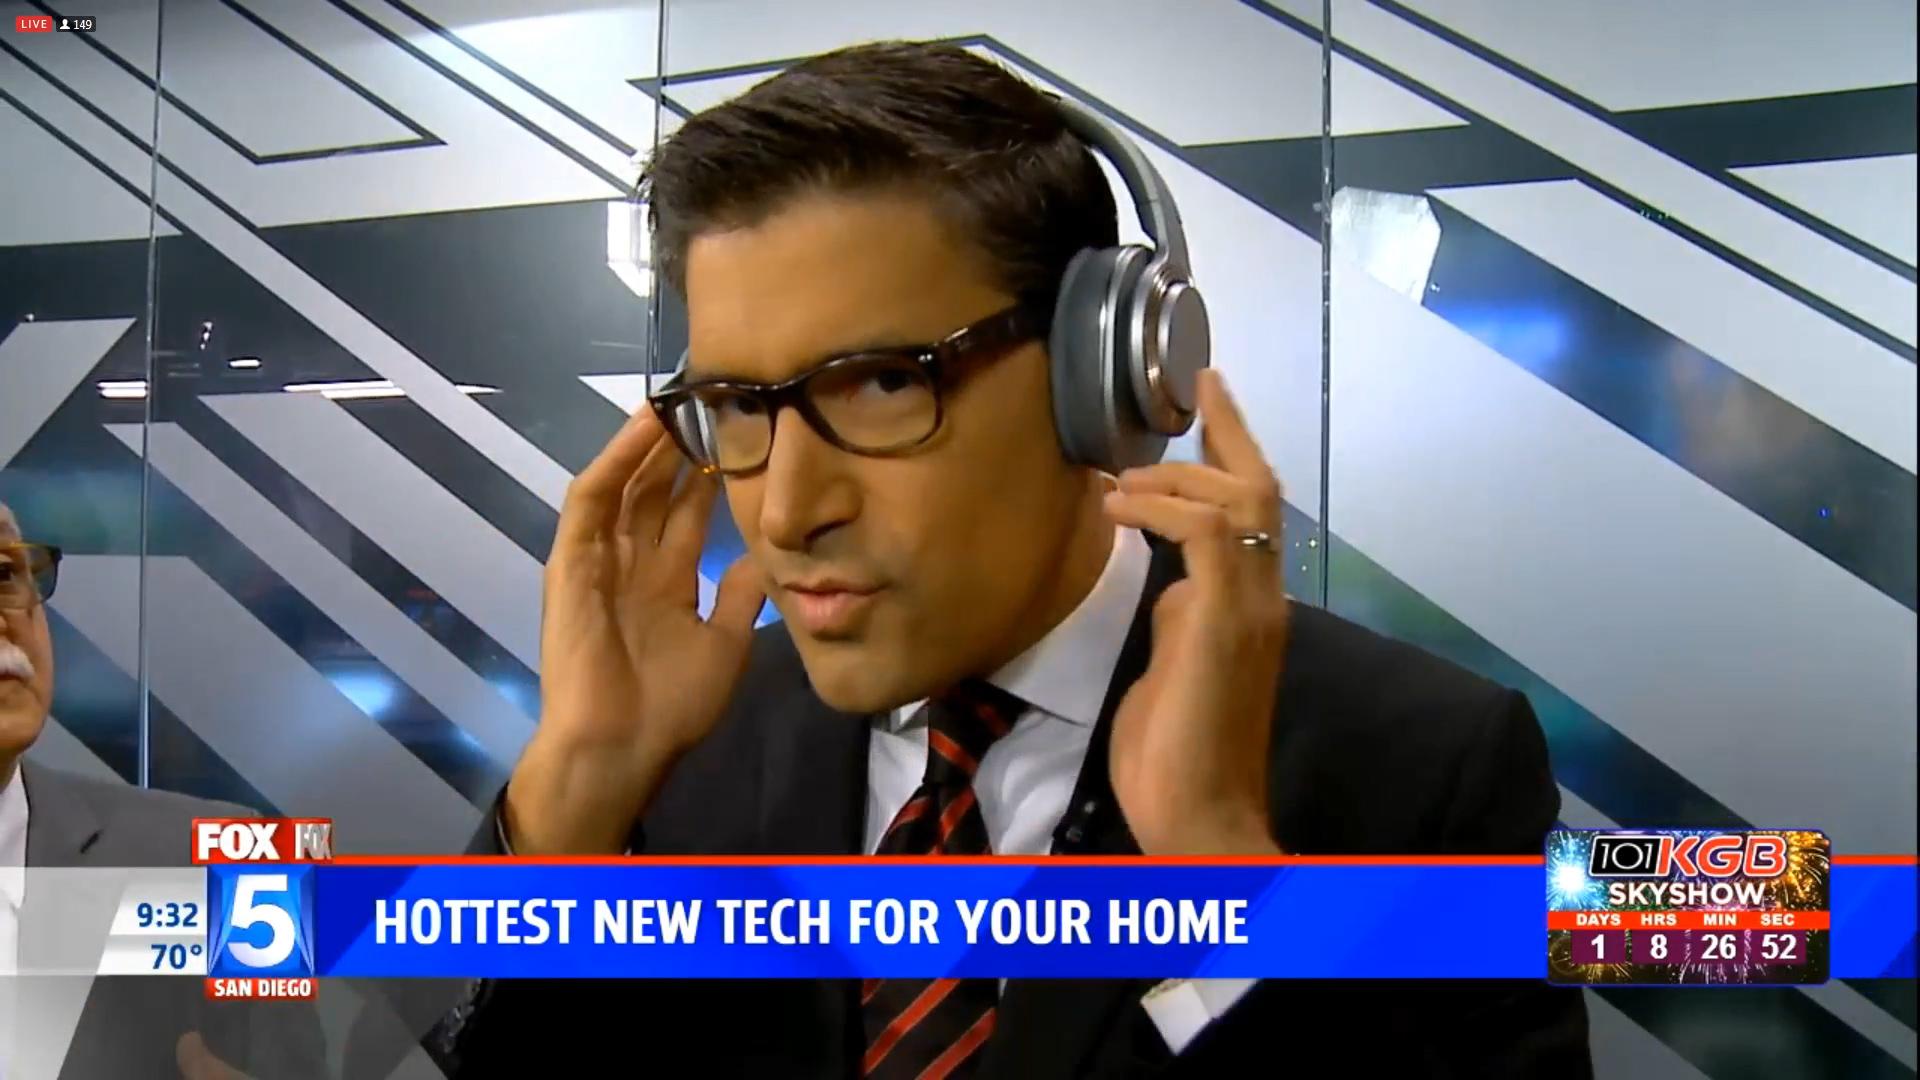 CLEER FLOW HYBRID NOISE CANCELLING HEADPHONES - $279.99Shop Now